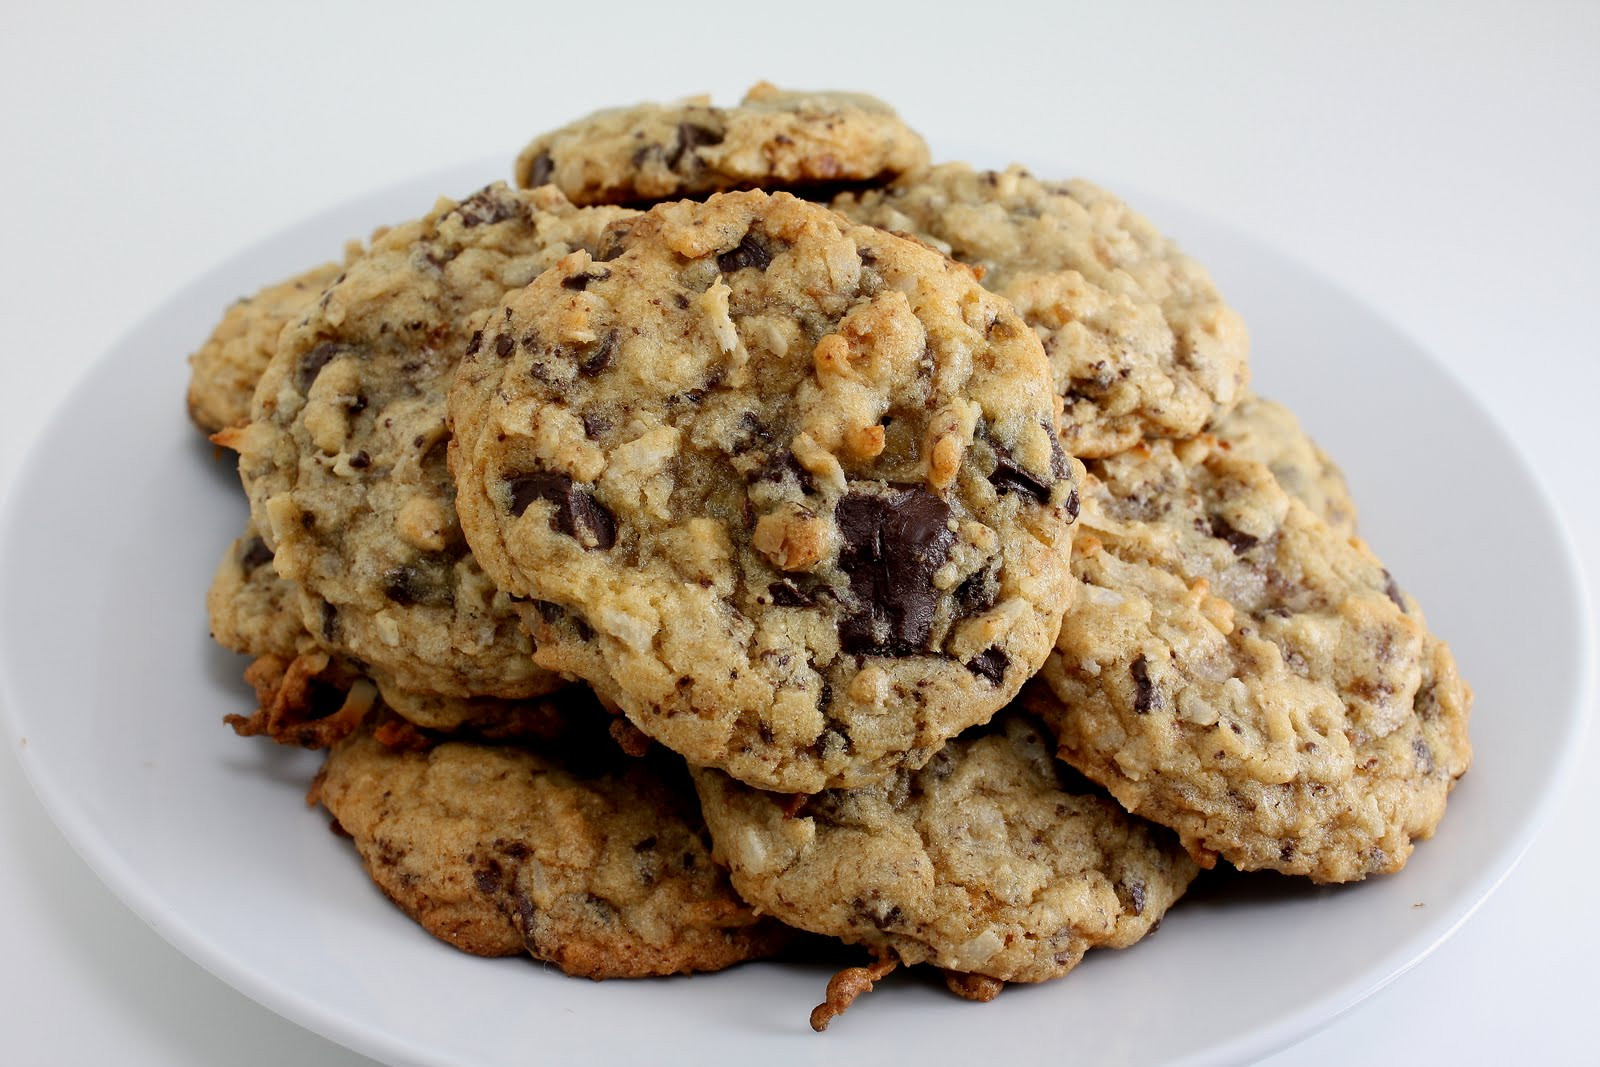 Coconut Chocolate Chip Cookies  Elizabeth s Edible Experience Cookie eback